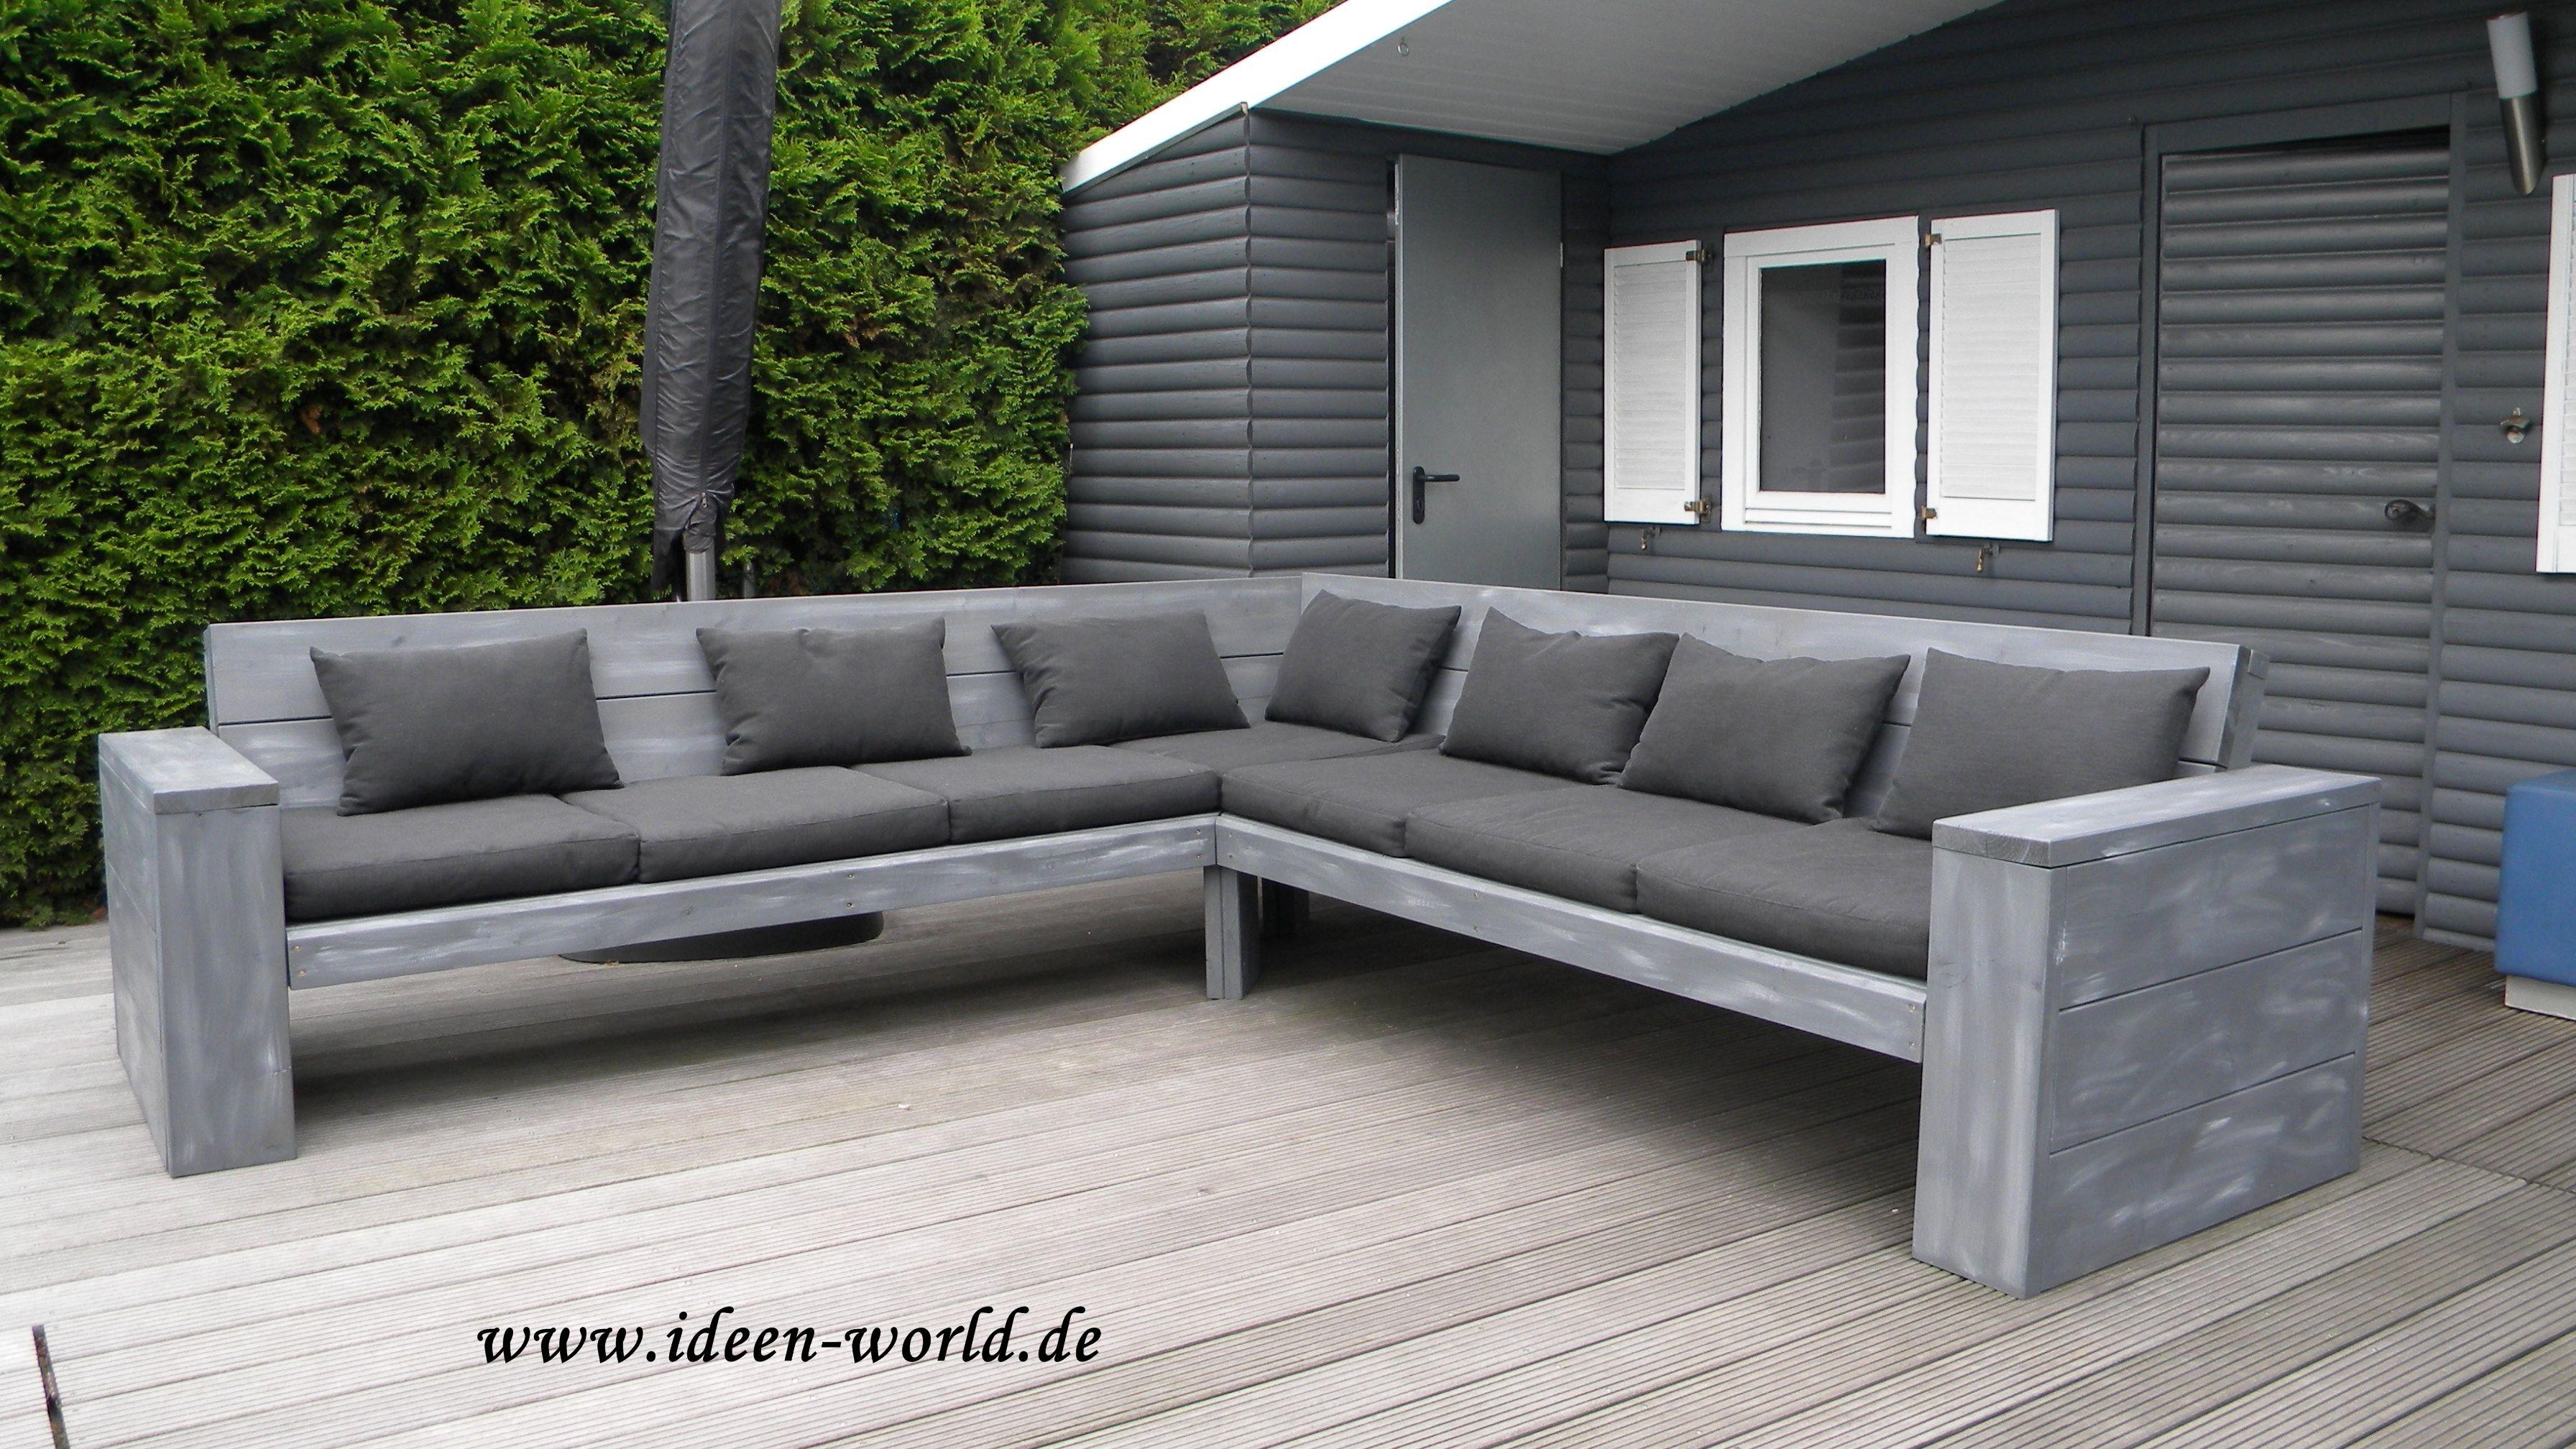 Holz Lounge Mobel Lounge Mobel Outdoor Mobel Aussenmobel